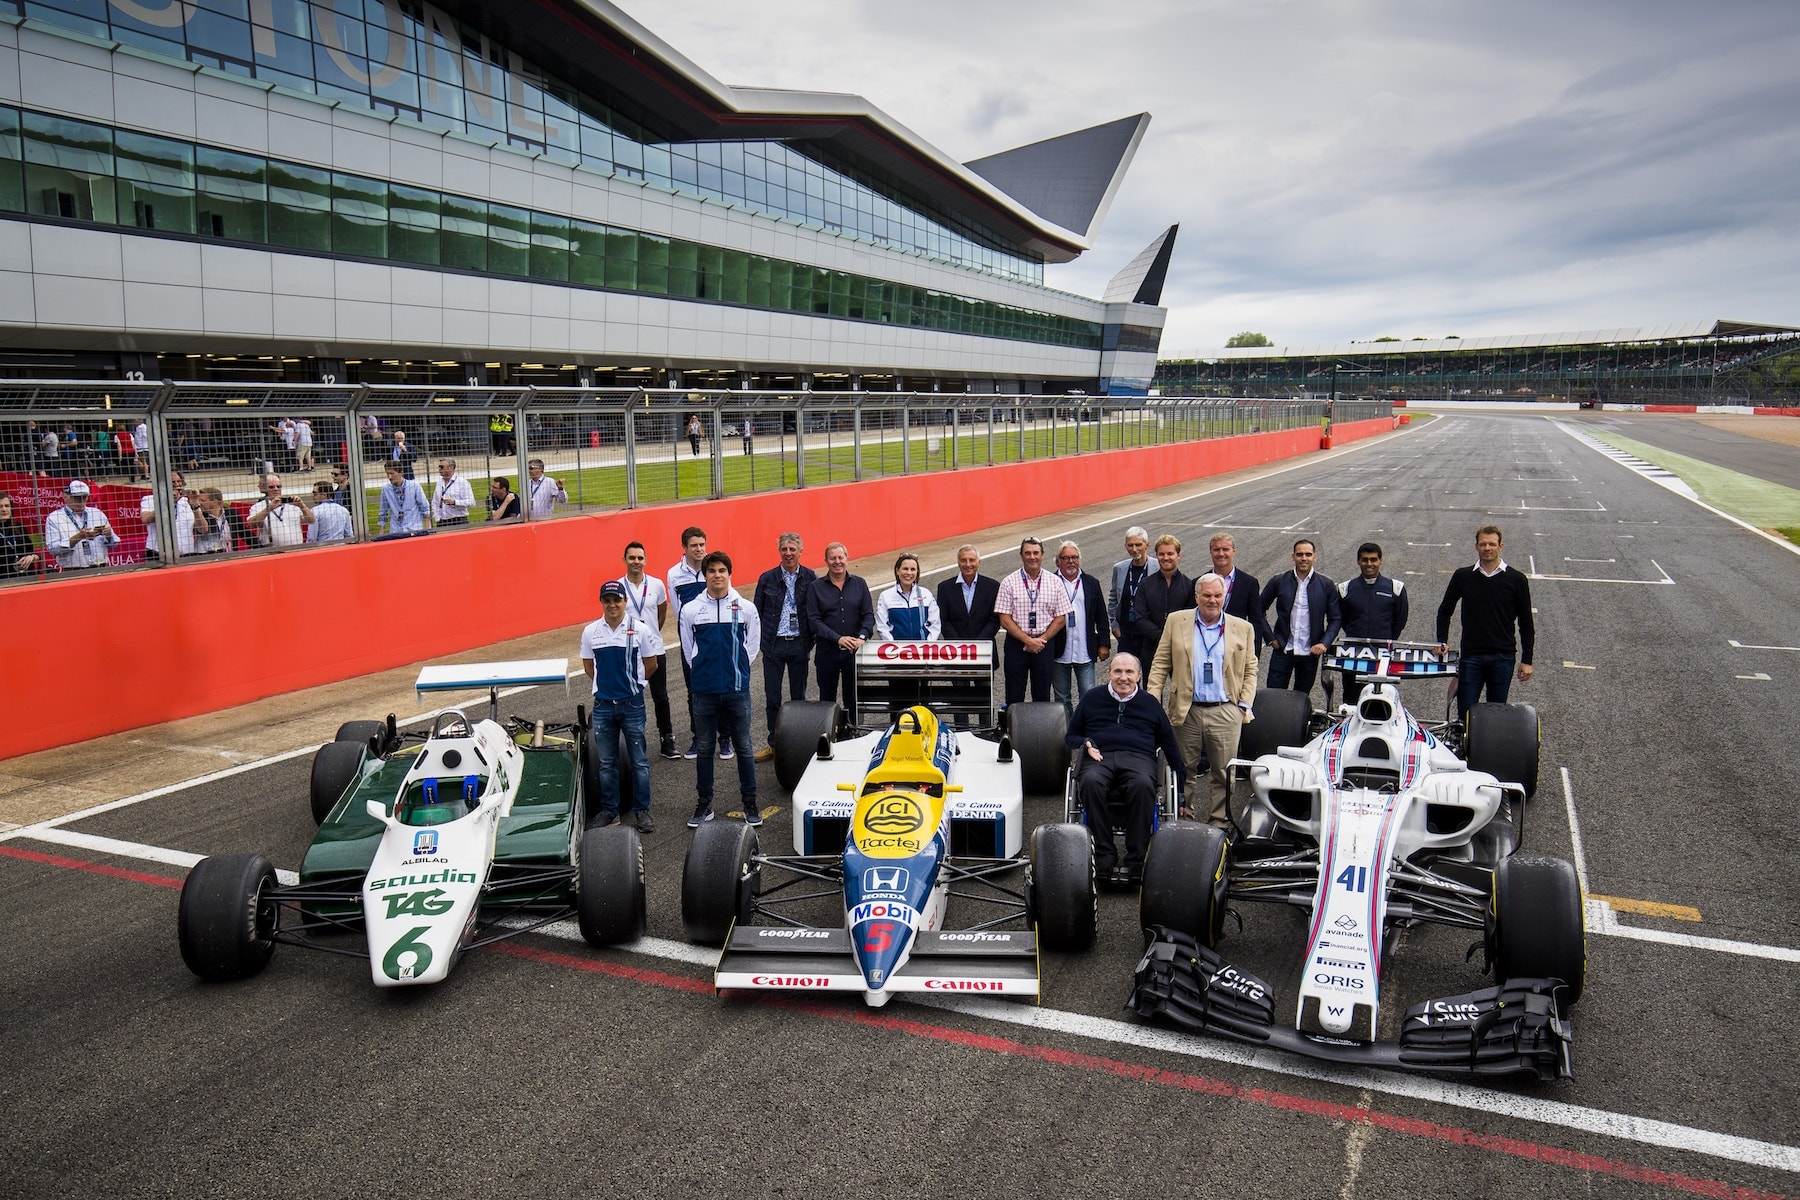 Frank Williams cars at Silverstone 2017.jpg